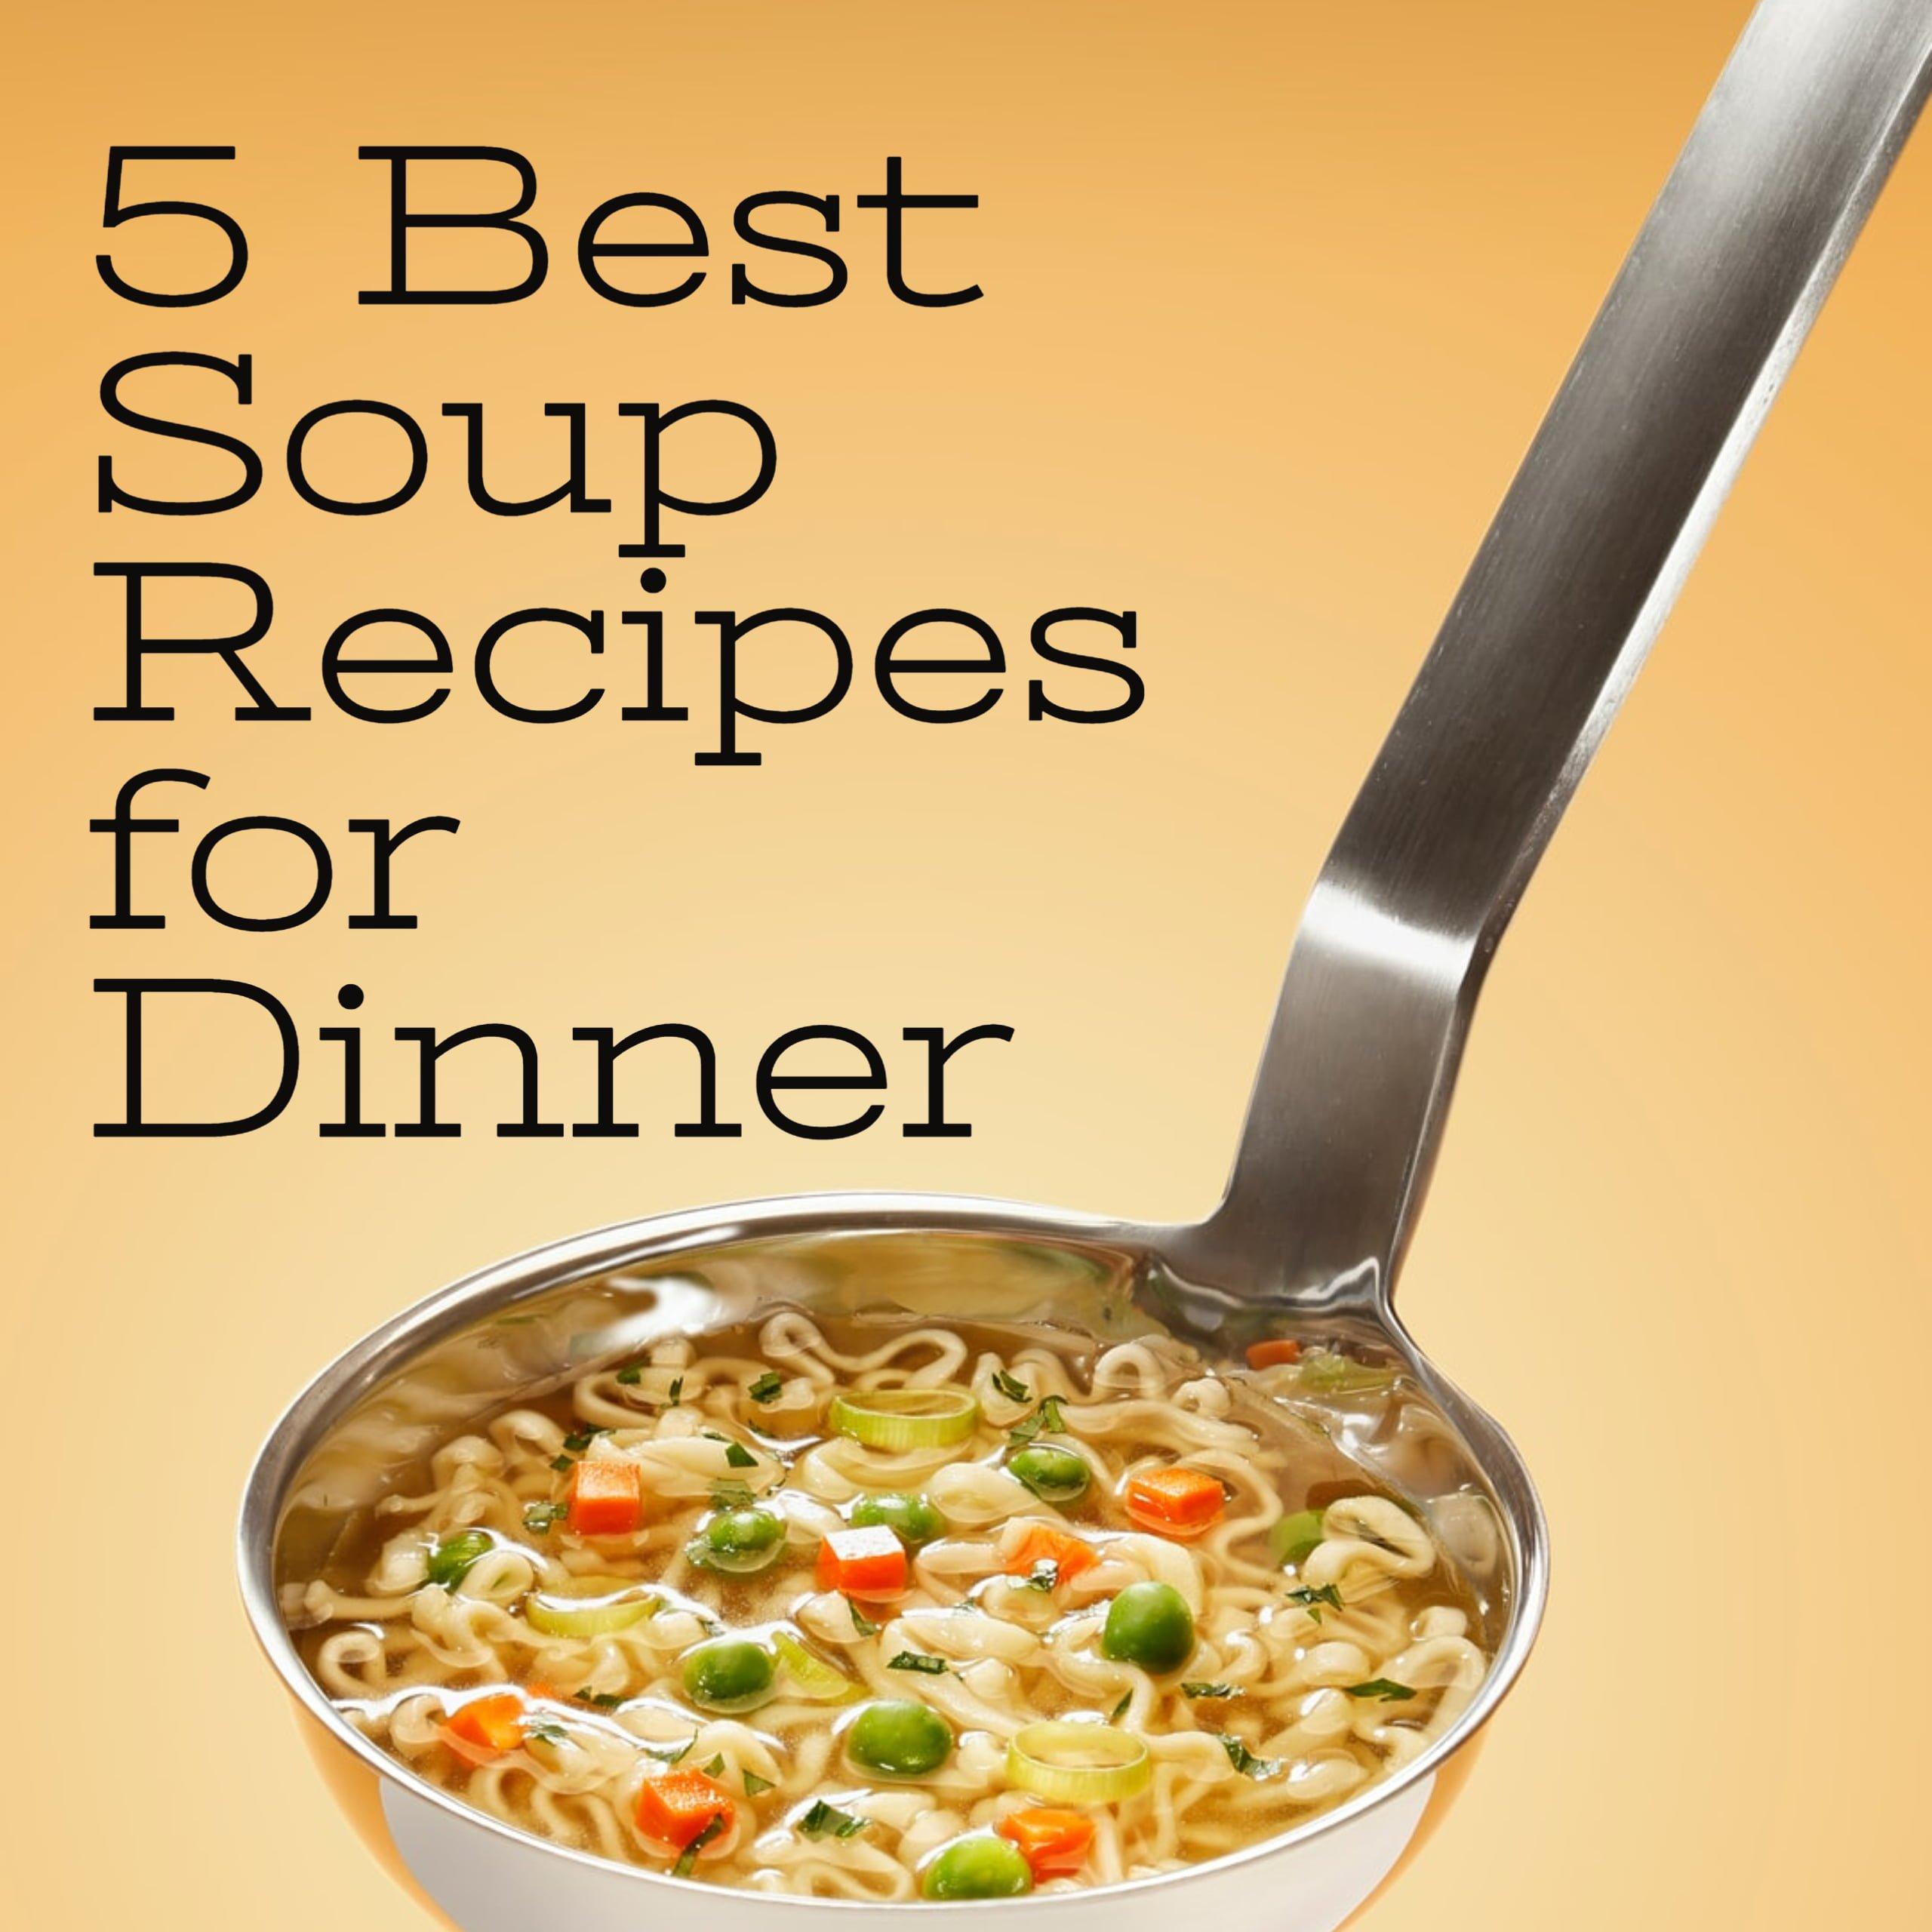 5 Best Soup Recipes for Dinner